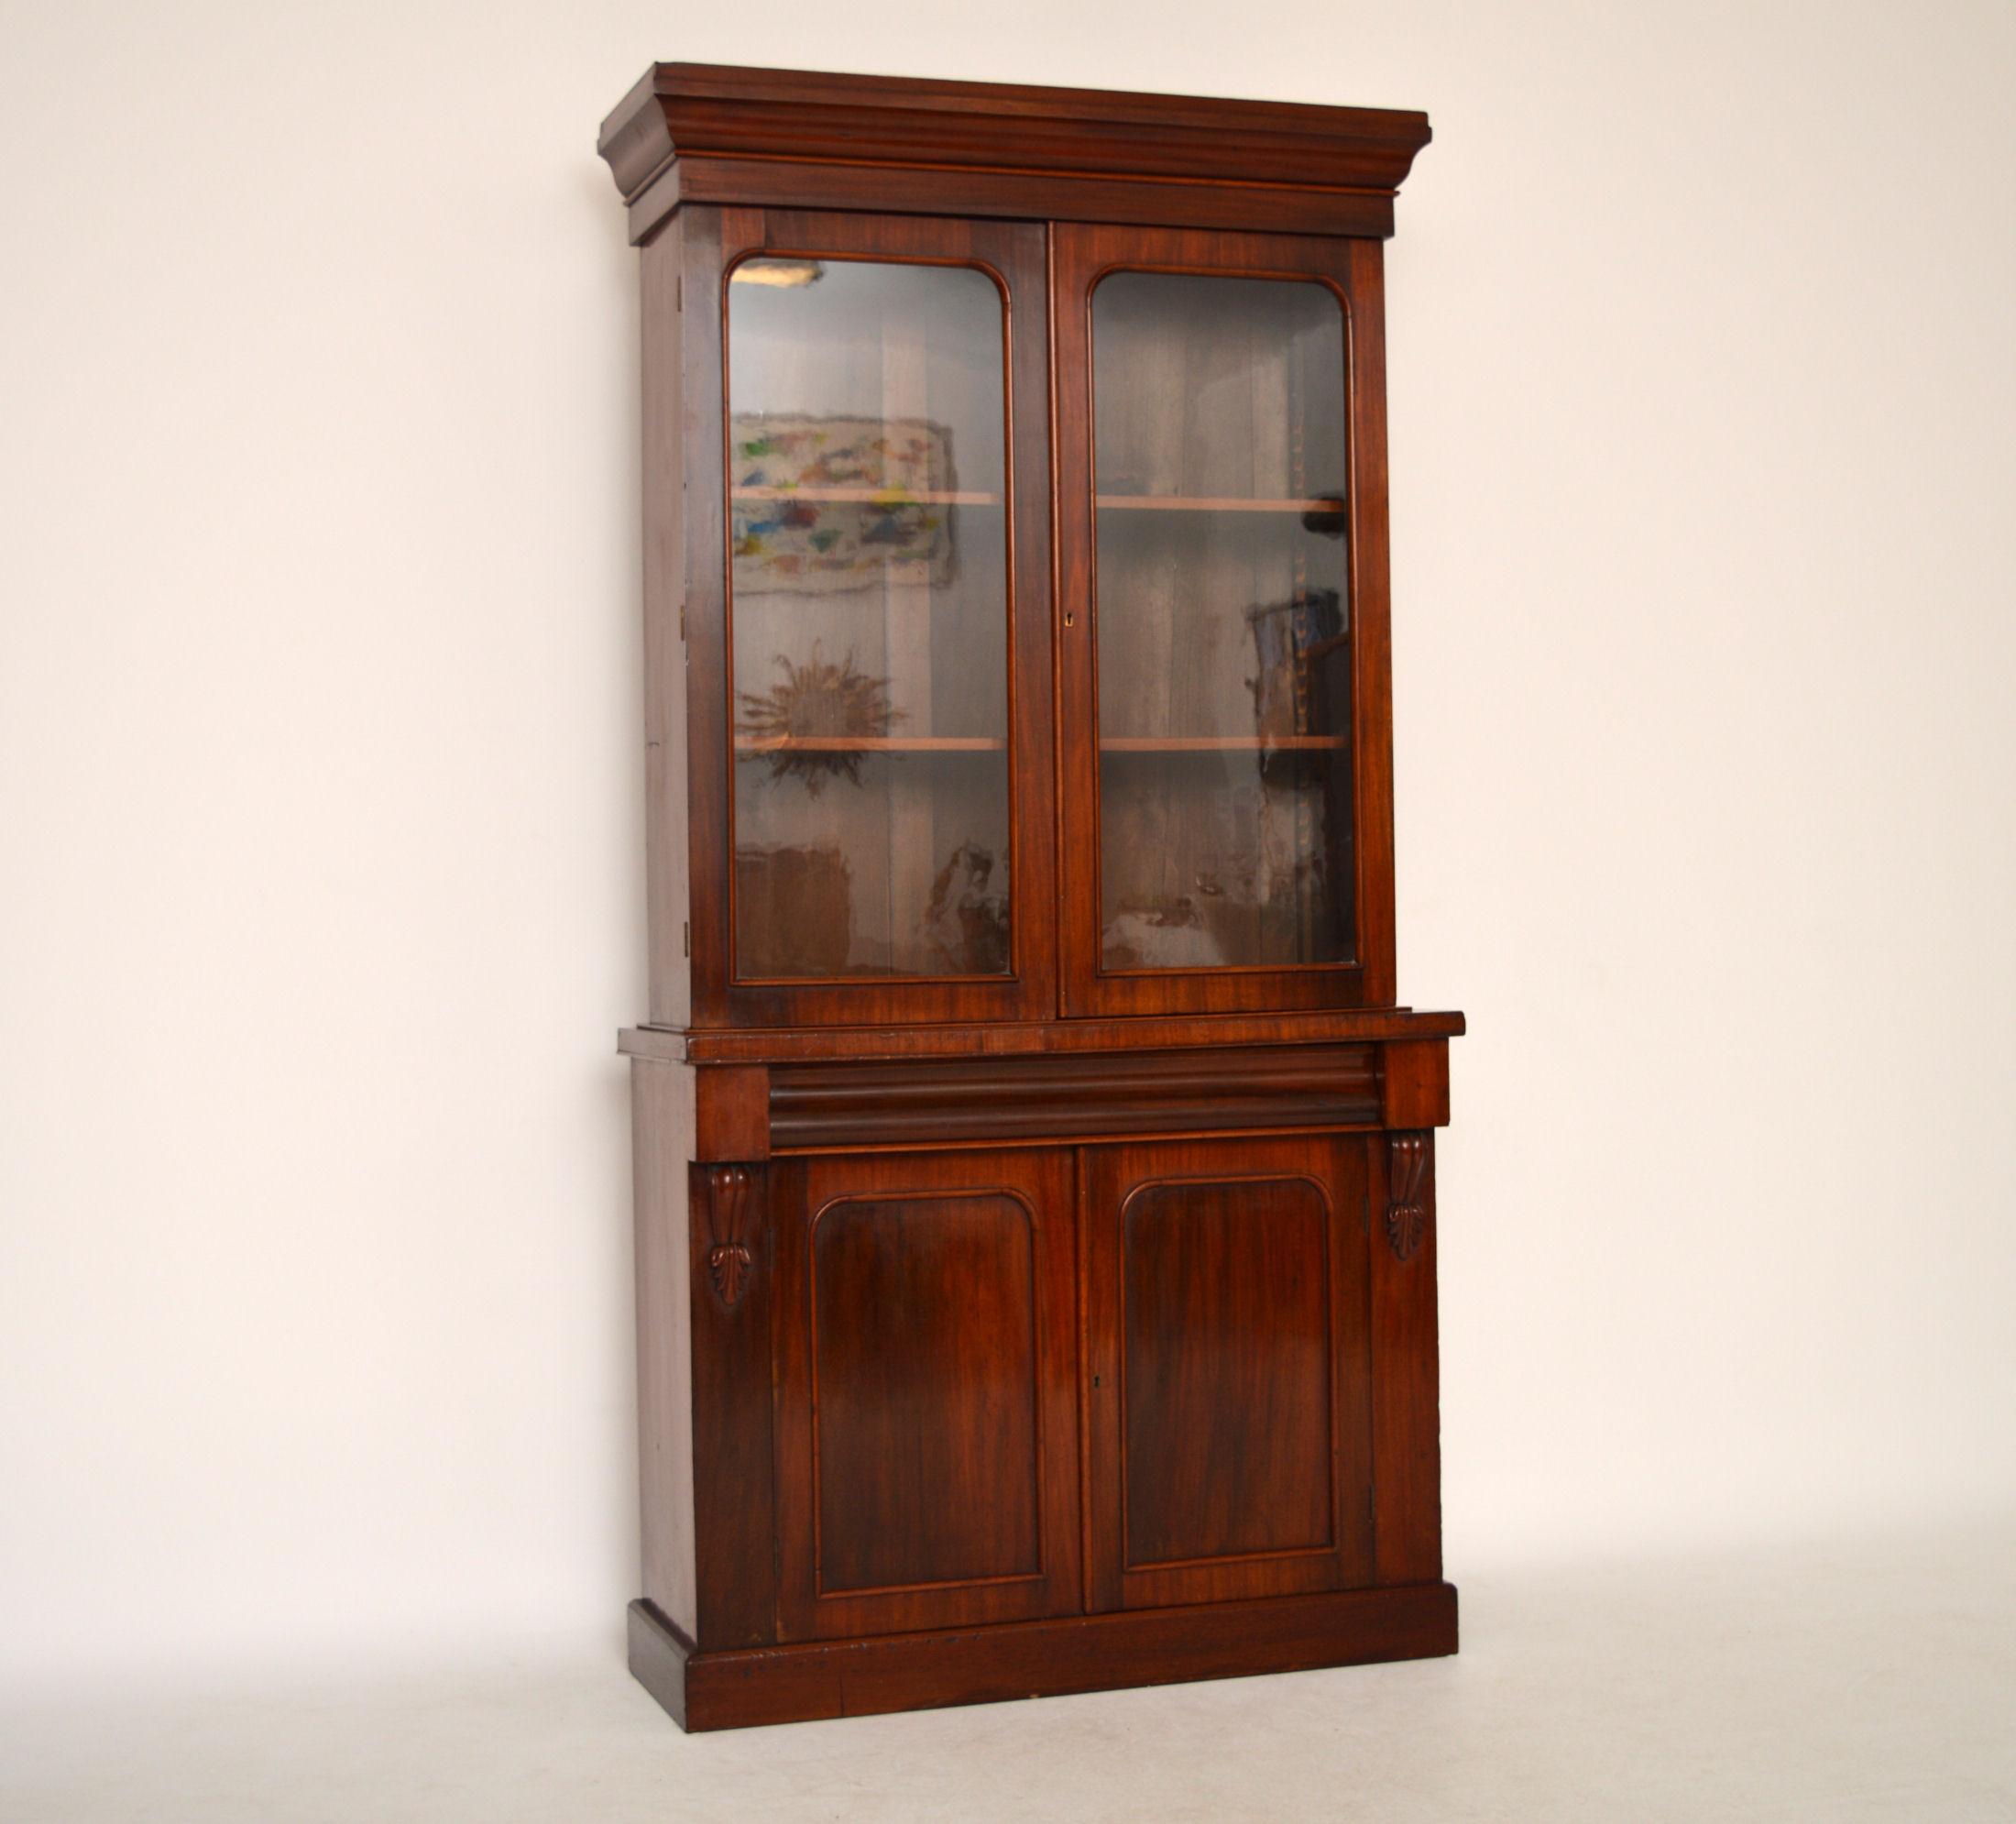 antike massive mahagoni vitrine original vitrinen englische antiquit ten m bel. Black Bedroom Furniture Sets. Home Design Ideas